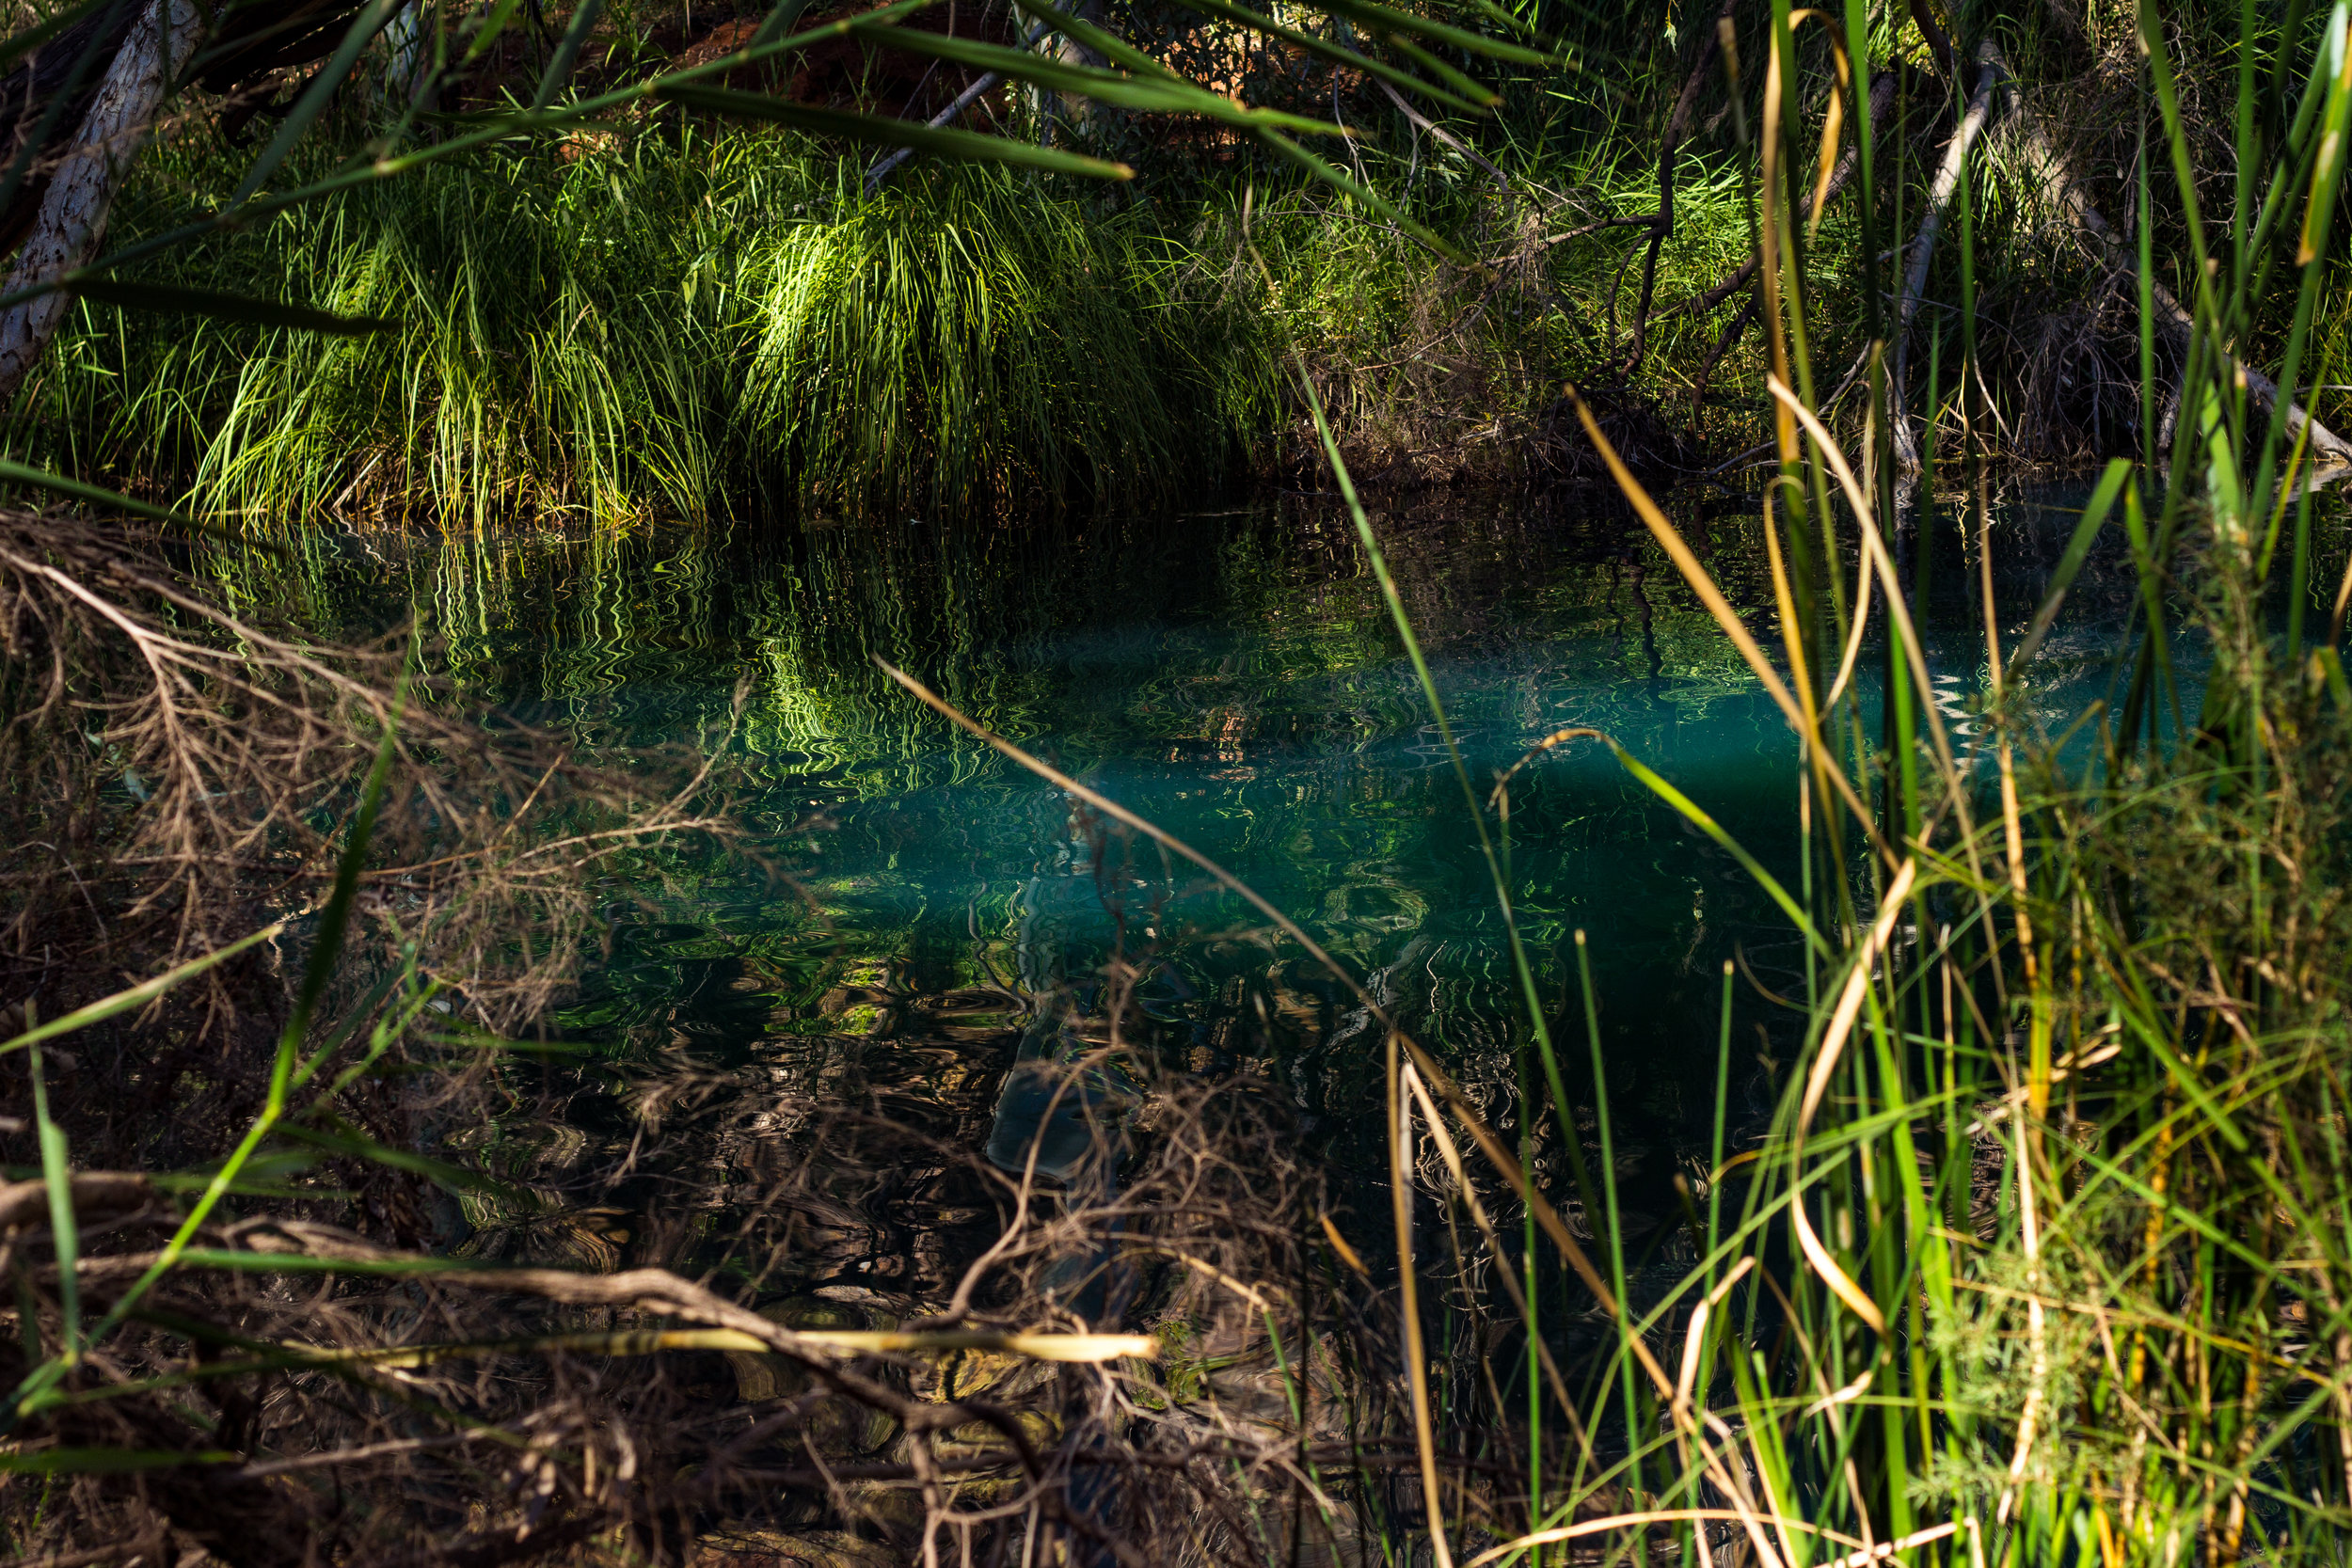 A lake located in Karijini, Western Australia